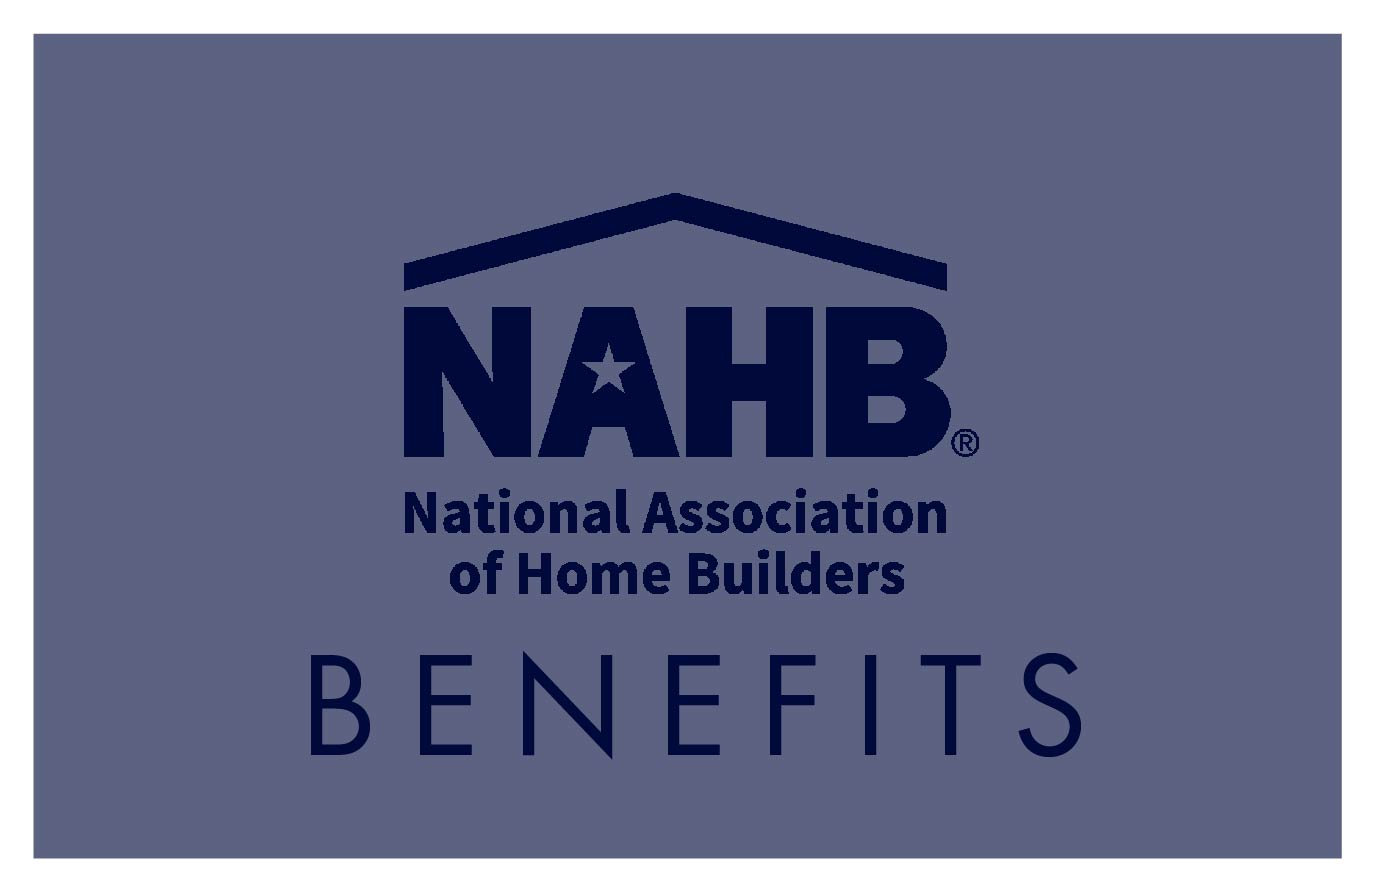 NAHB-BENEFITS.jpg